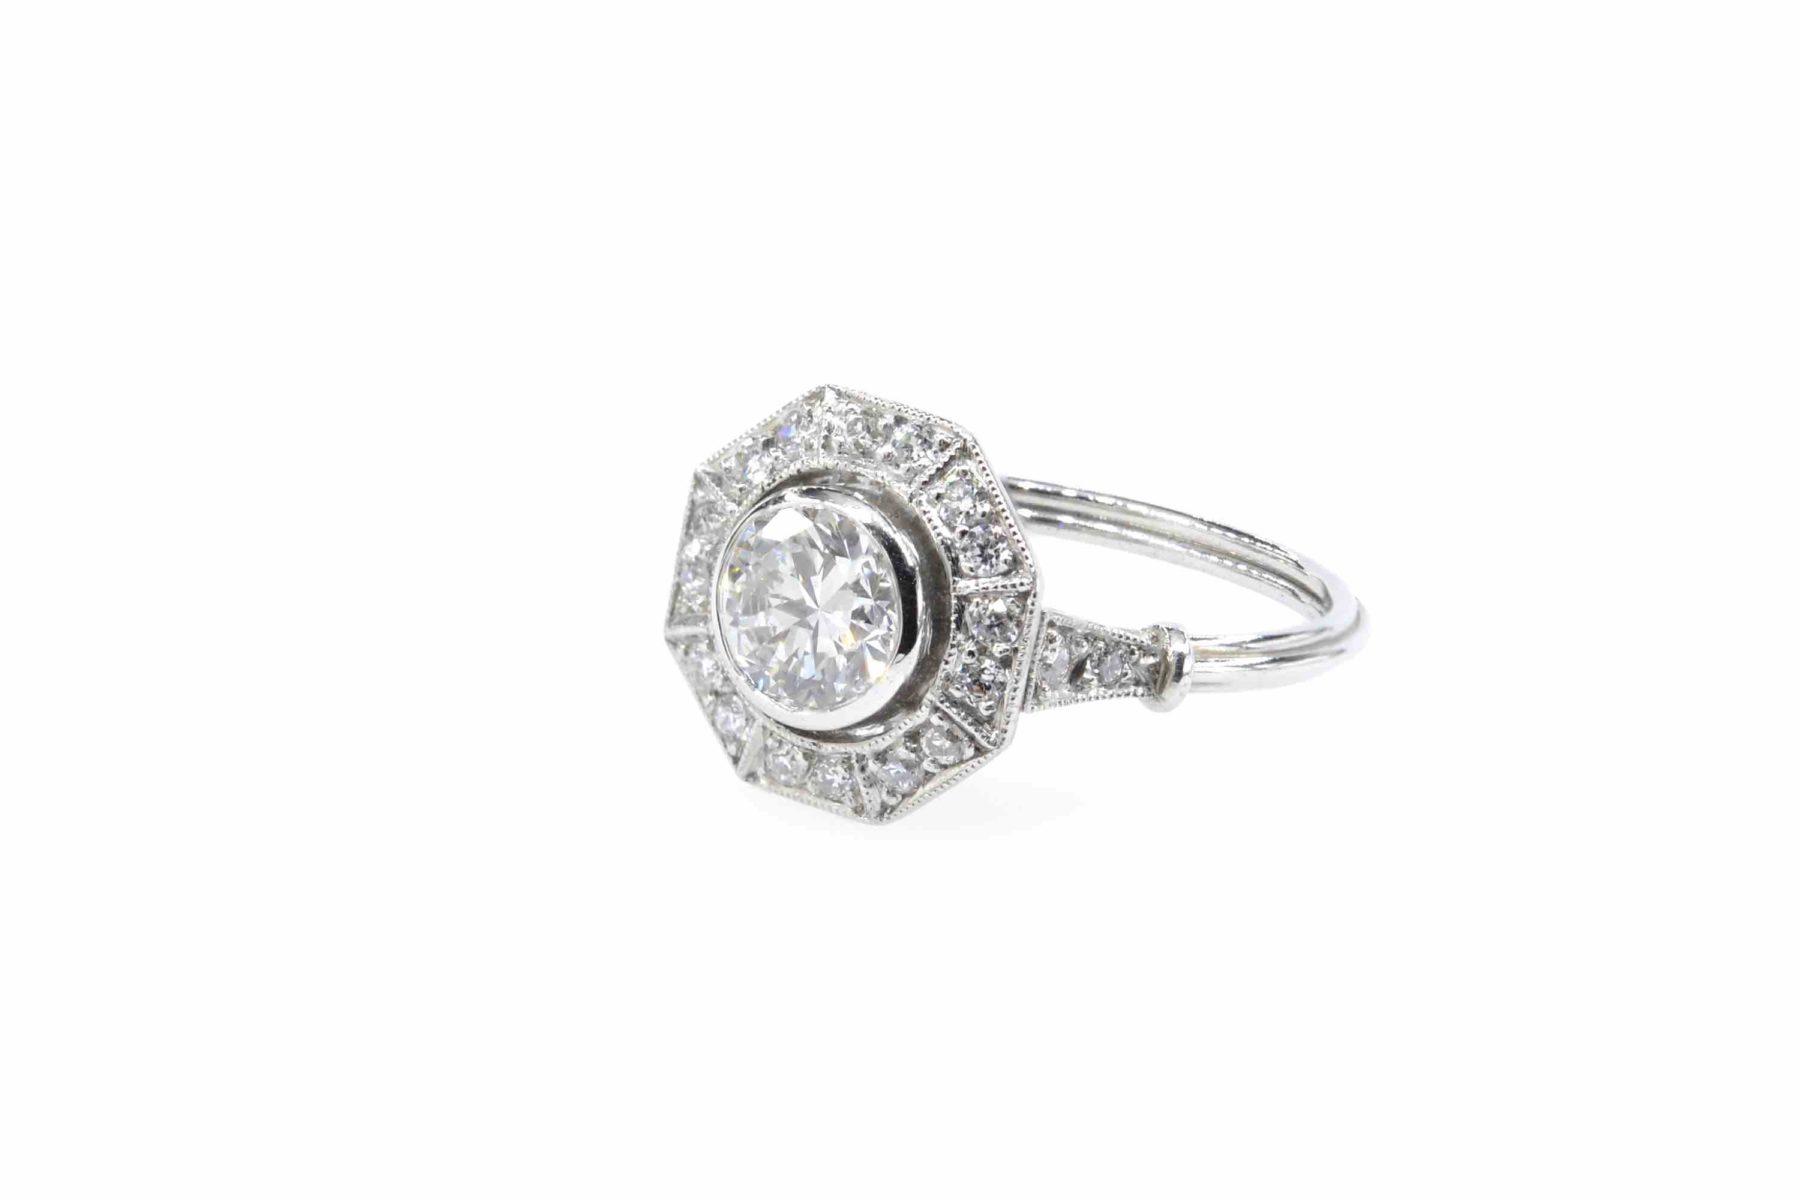 Bague diamant octogonale en platine